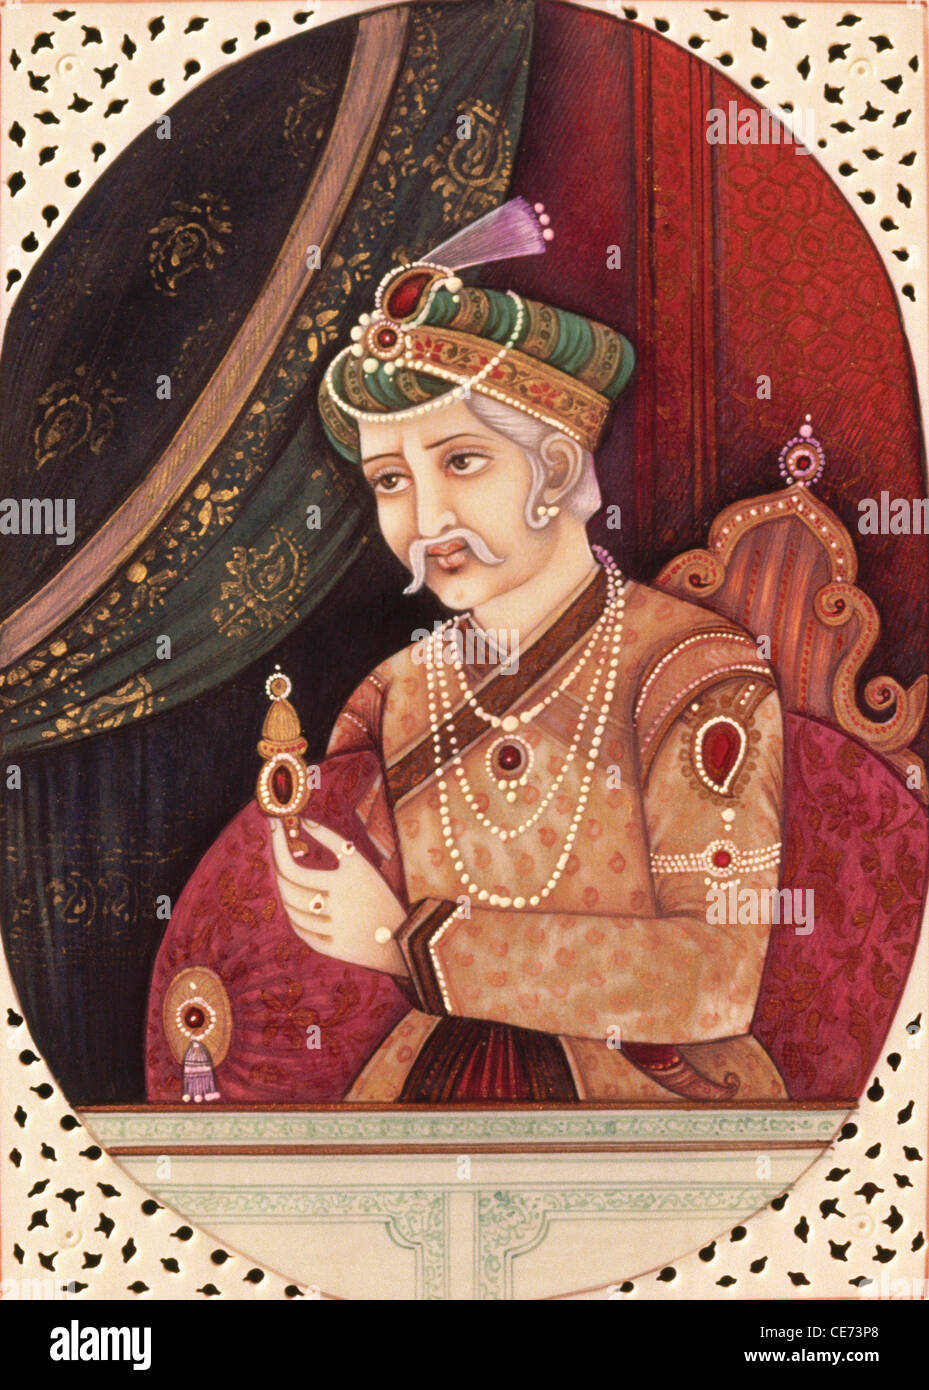 Akbar Miniature Painting of Mughal Emperor - Stock Image